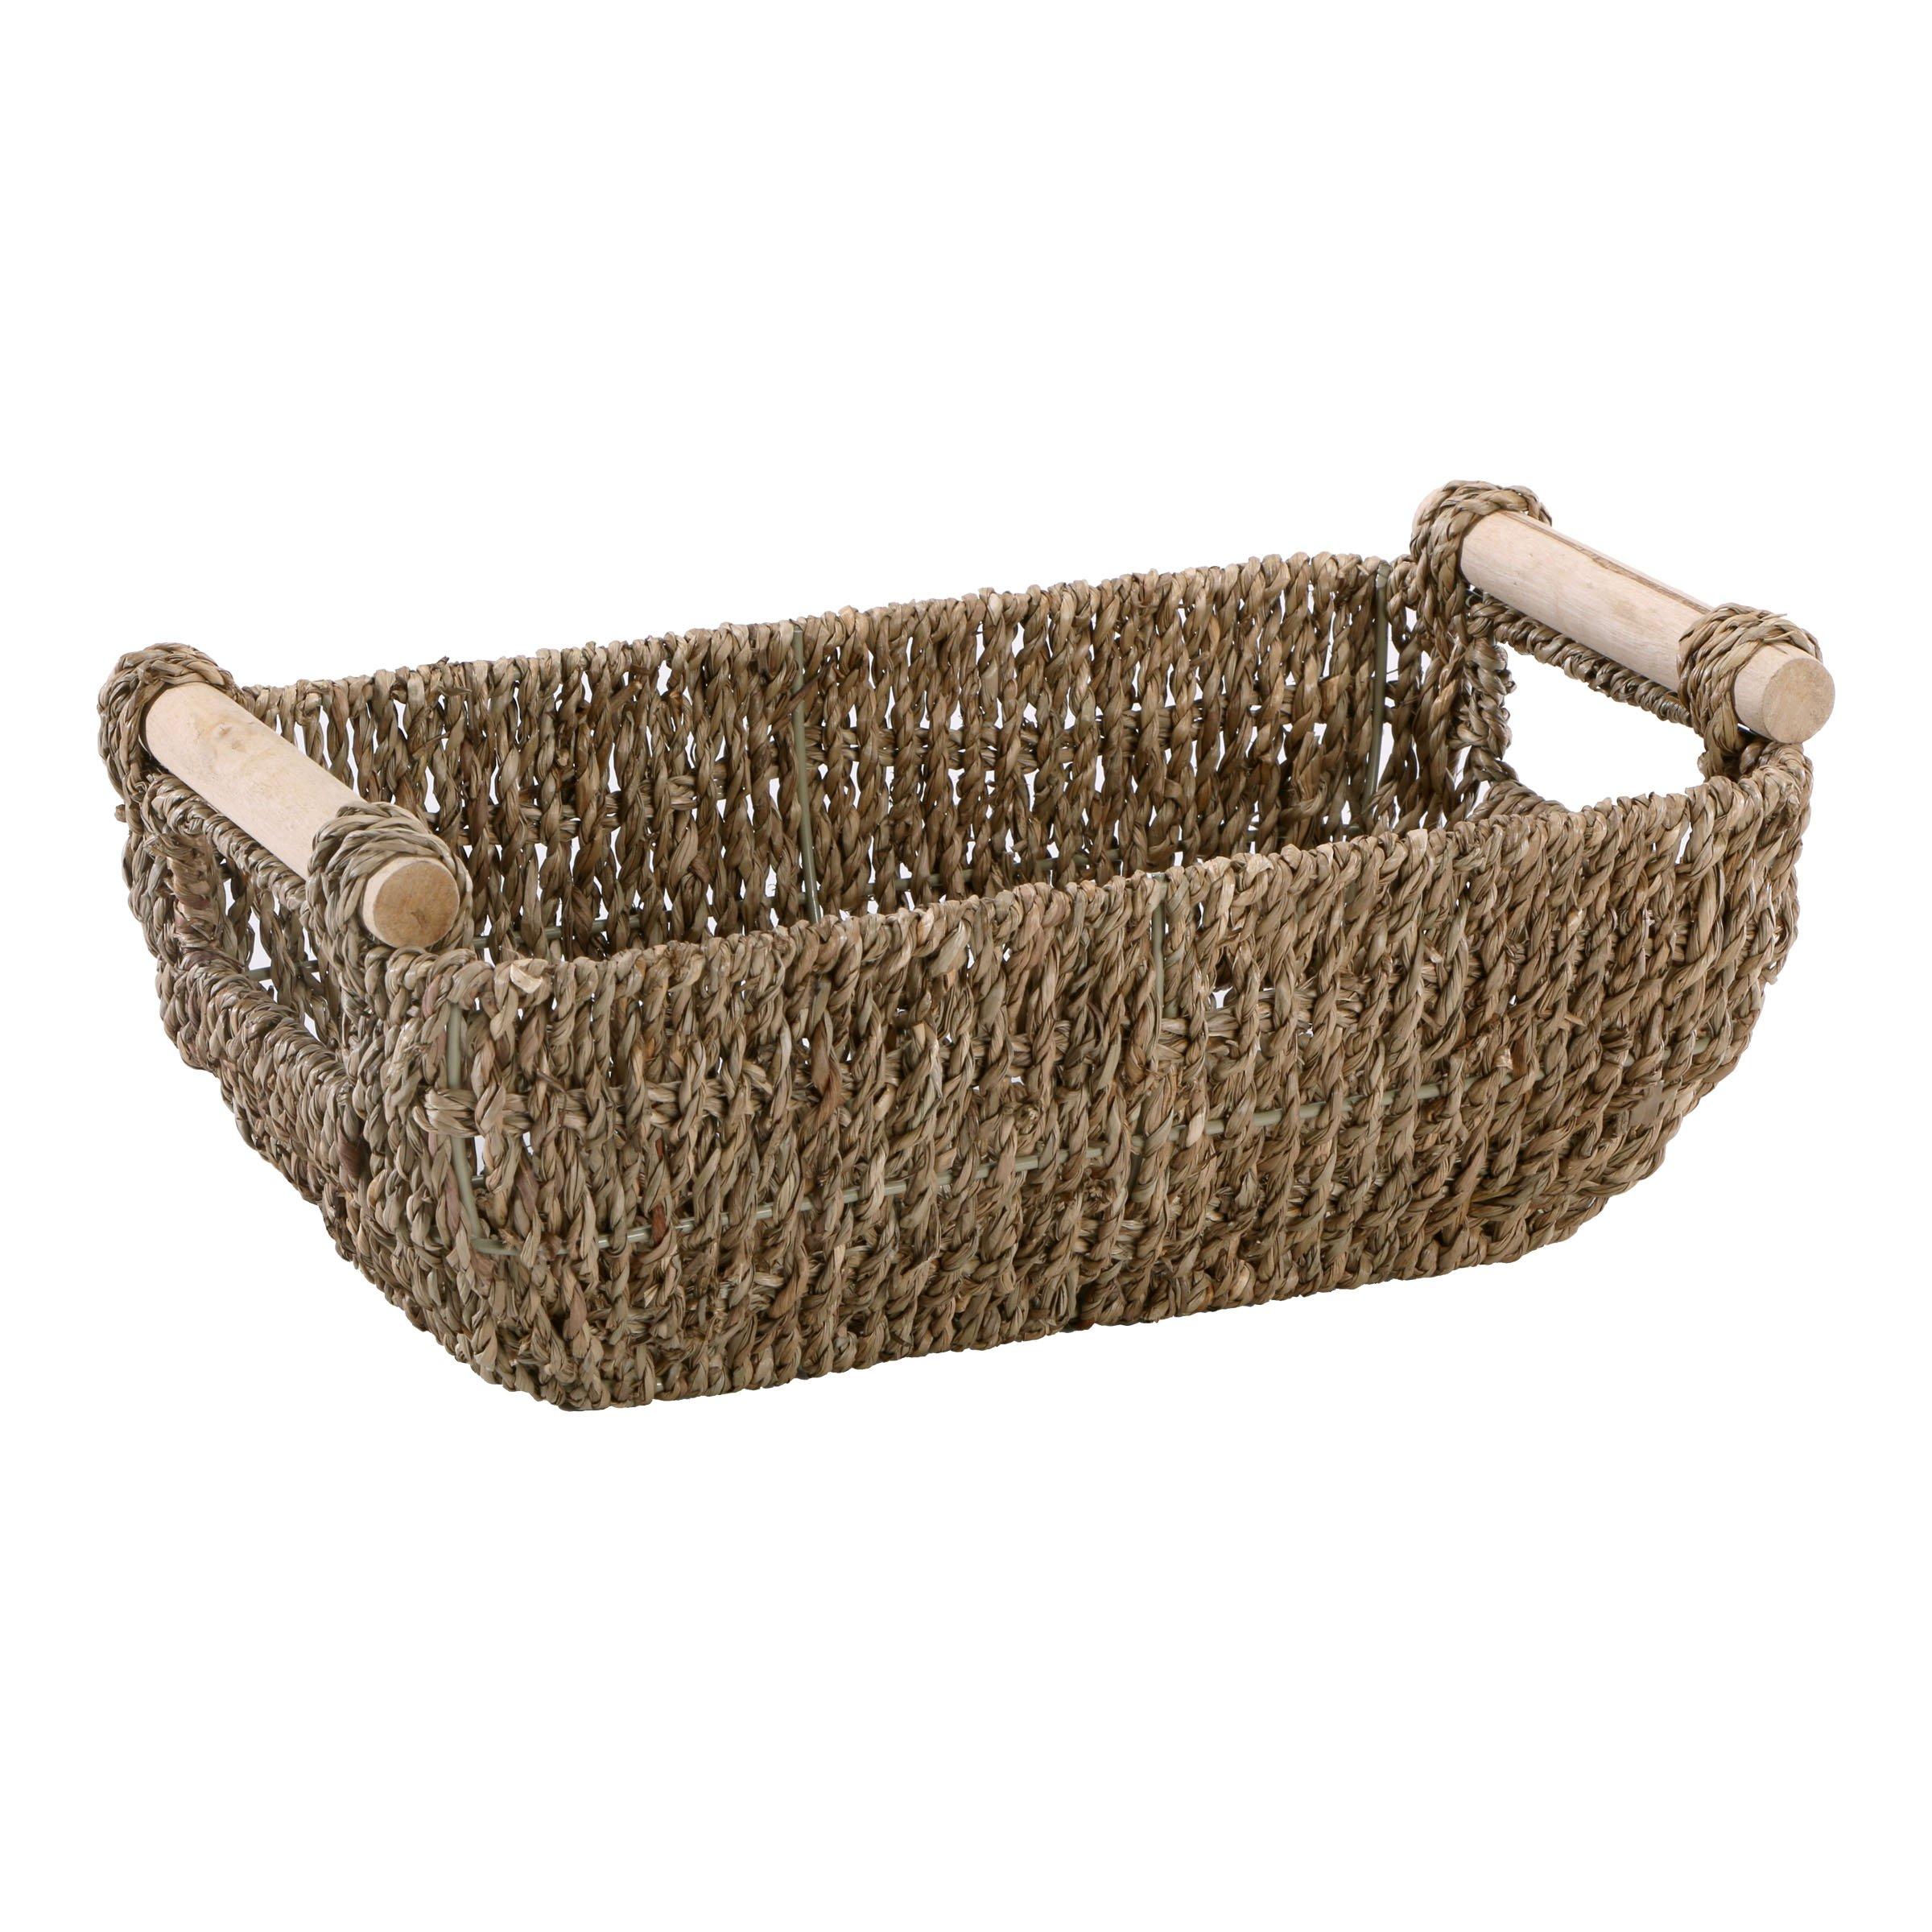 Hoffmaster BSK3000 Seagrass Basket with Handles, 4.25'' Height, 6.25'' Width, 12'' Length, Dark Brown